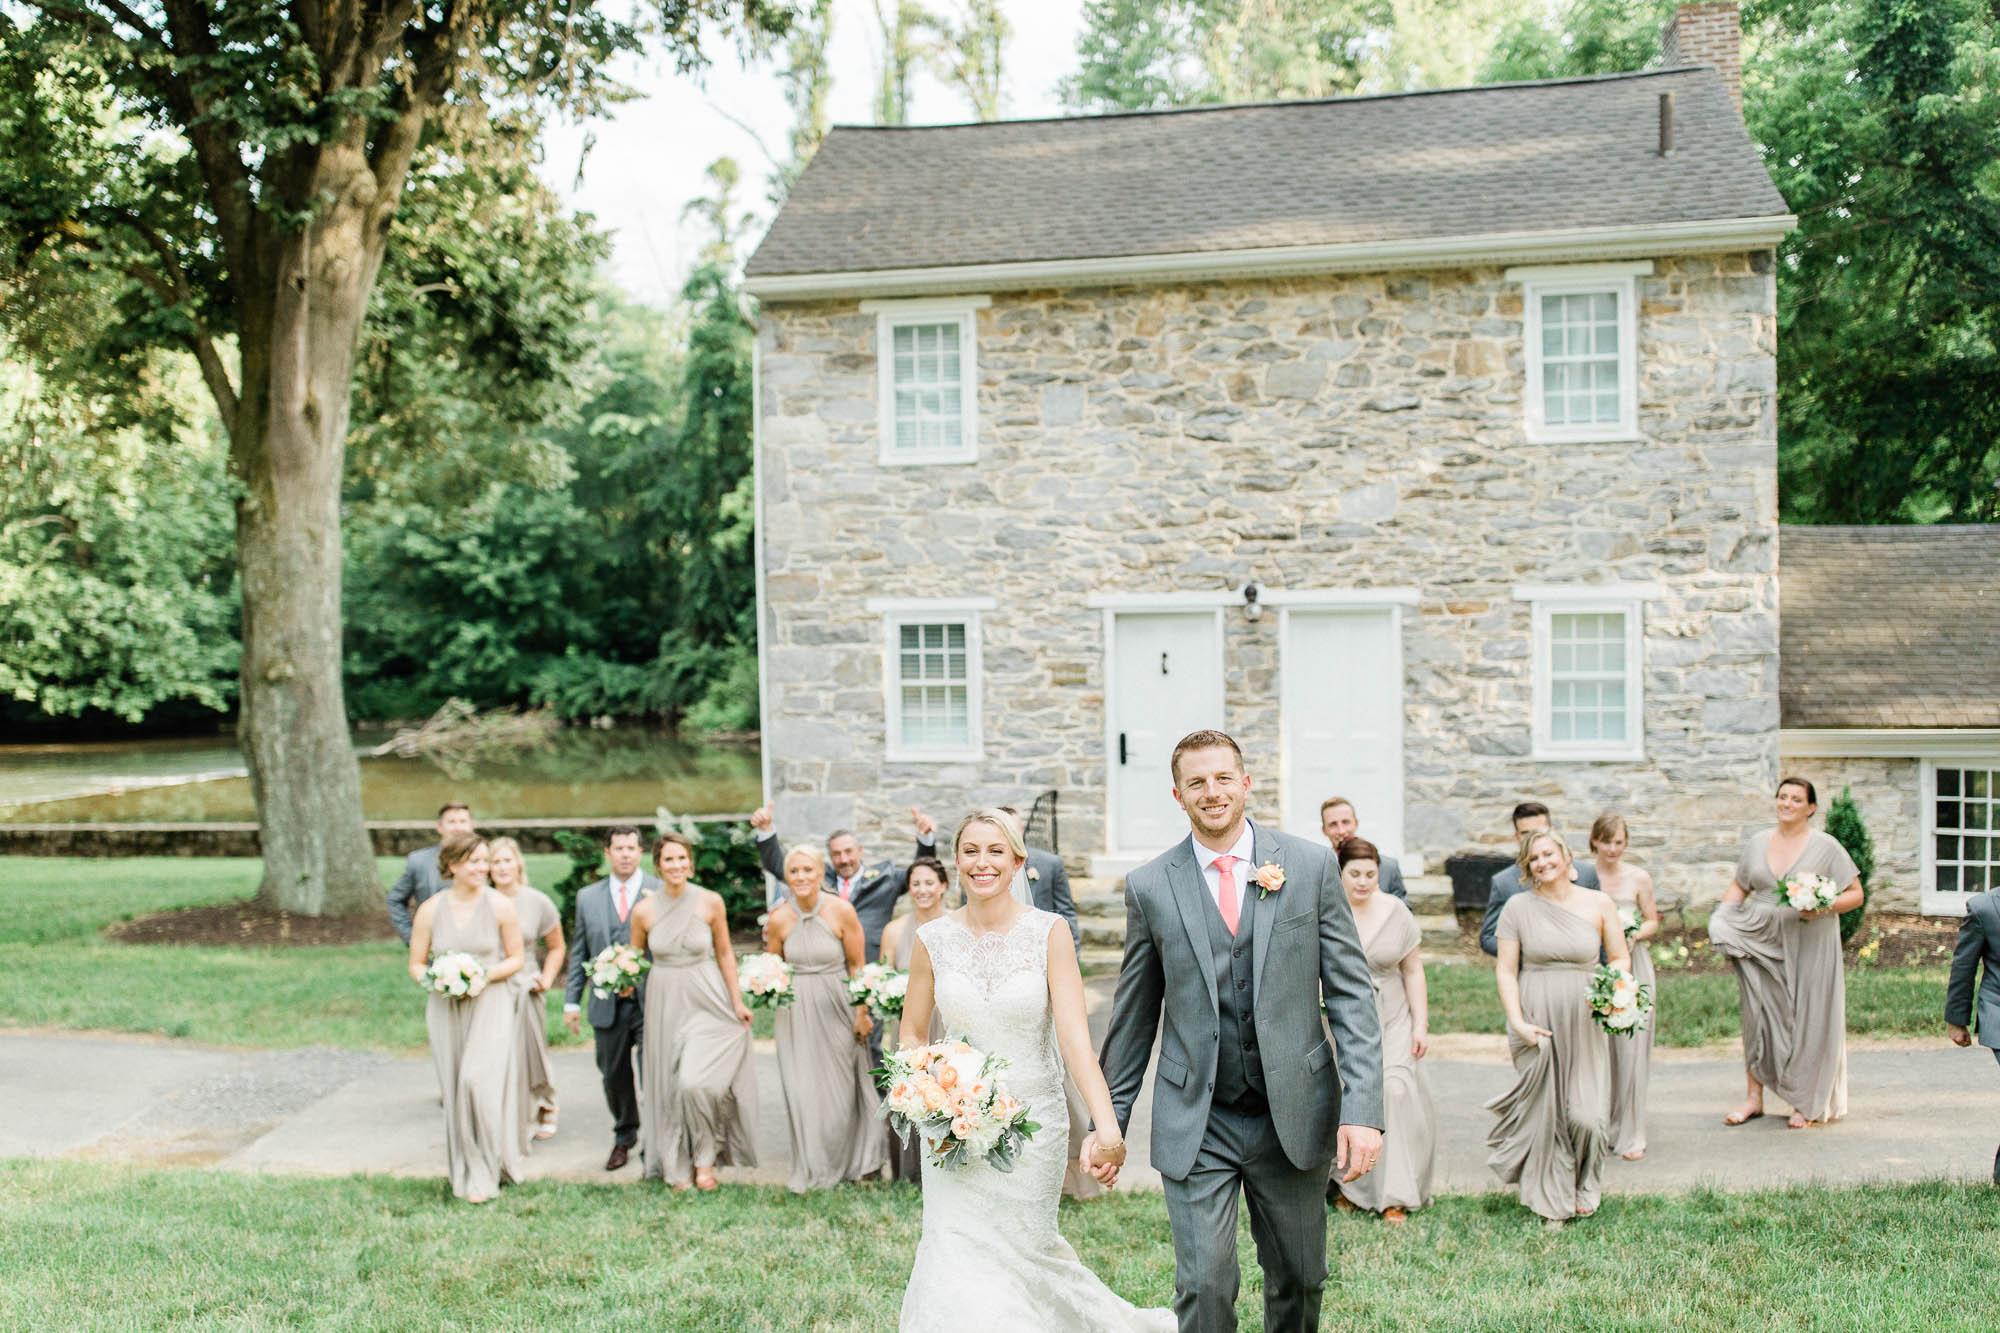 Allenberry-resort-historic-pennsylvania-wedding-10269.jpg